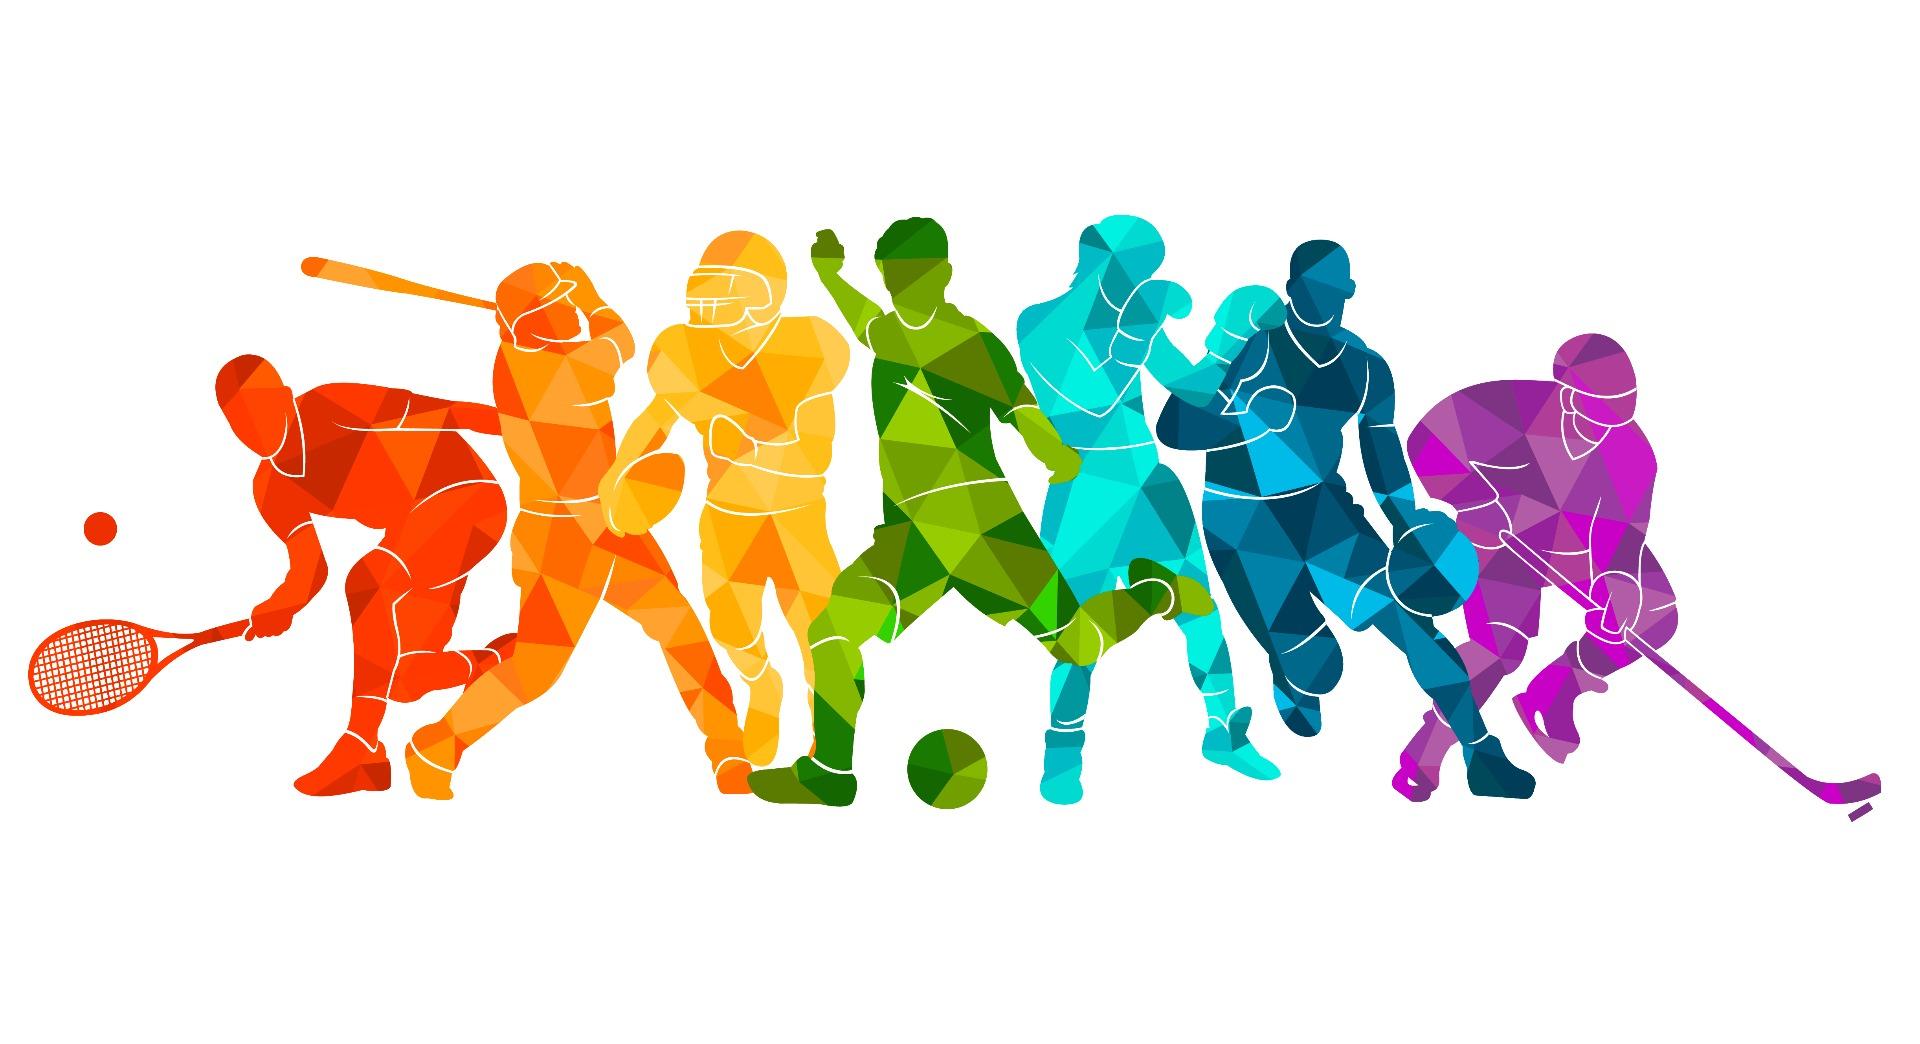 rainbow athlete outlines